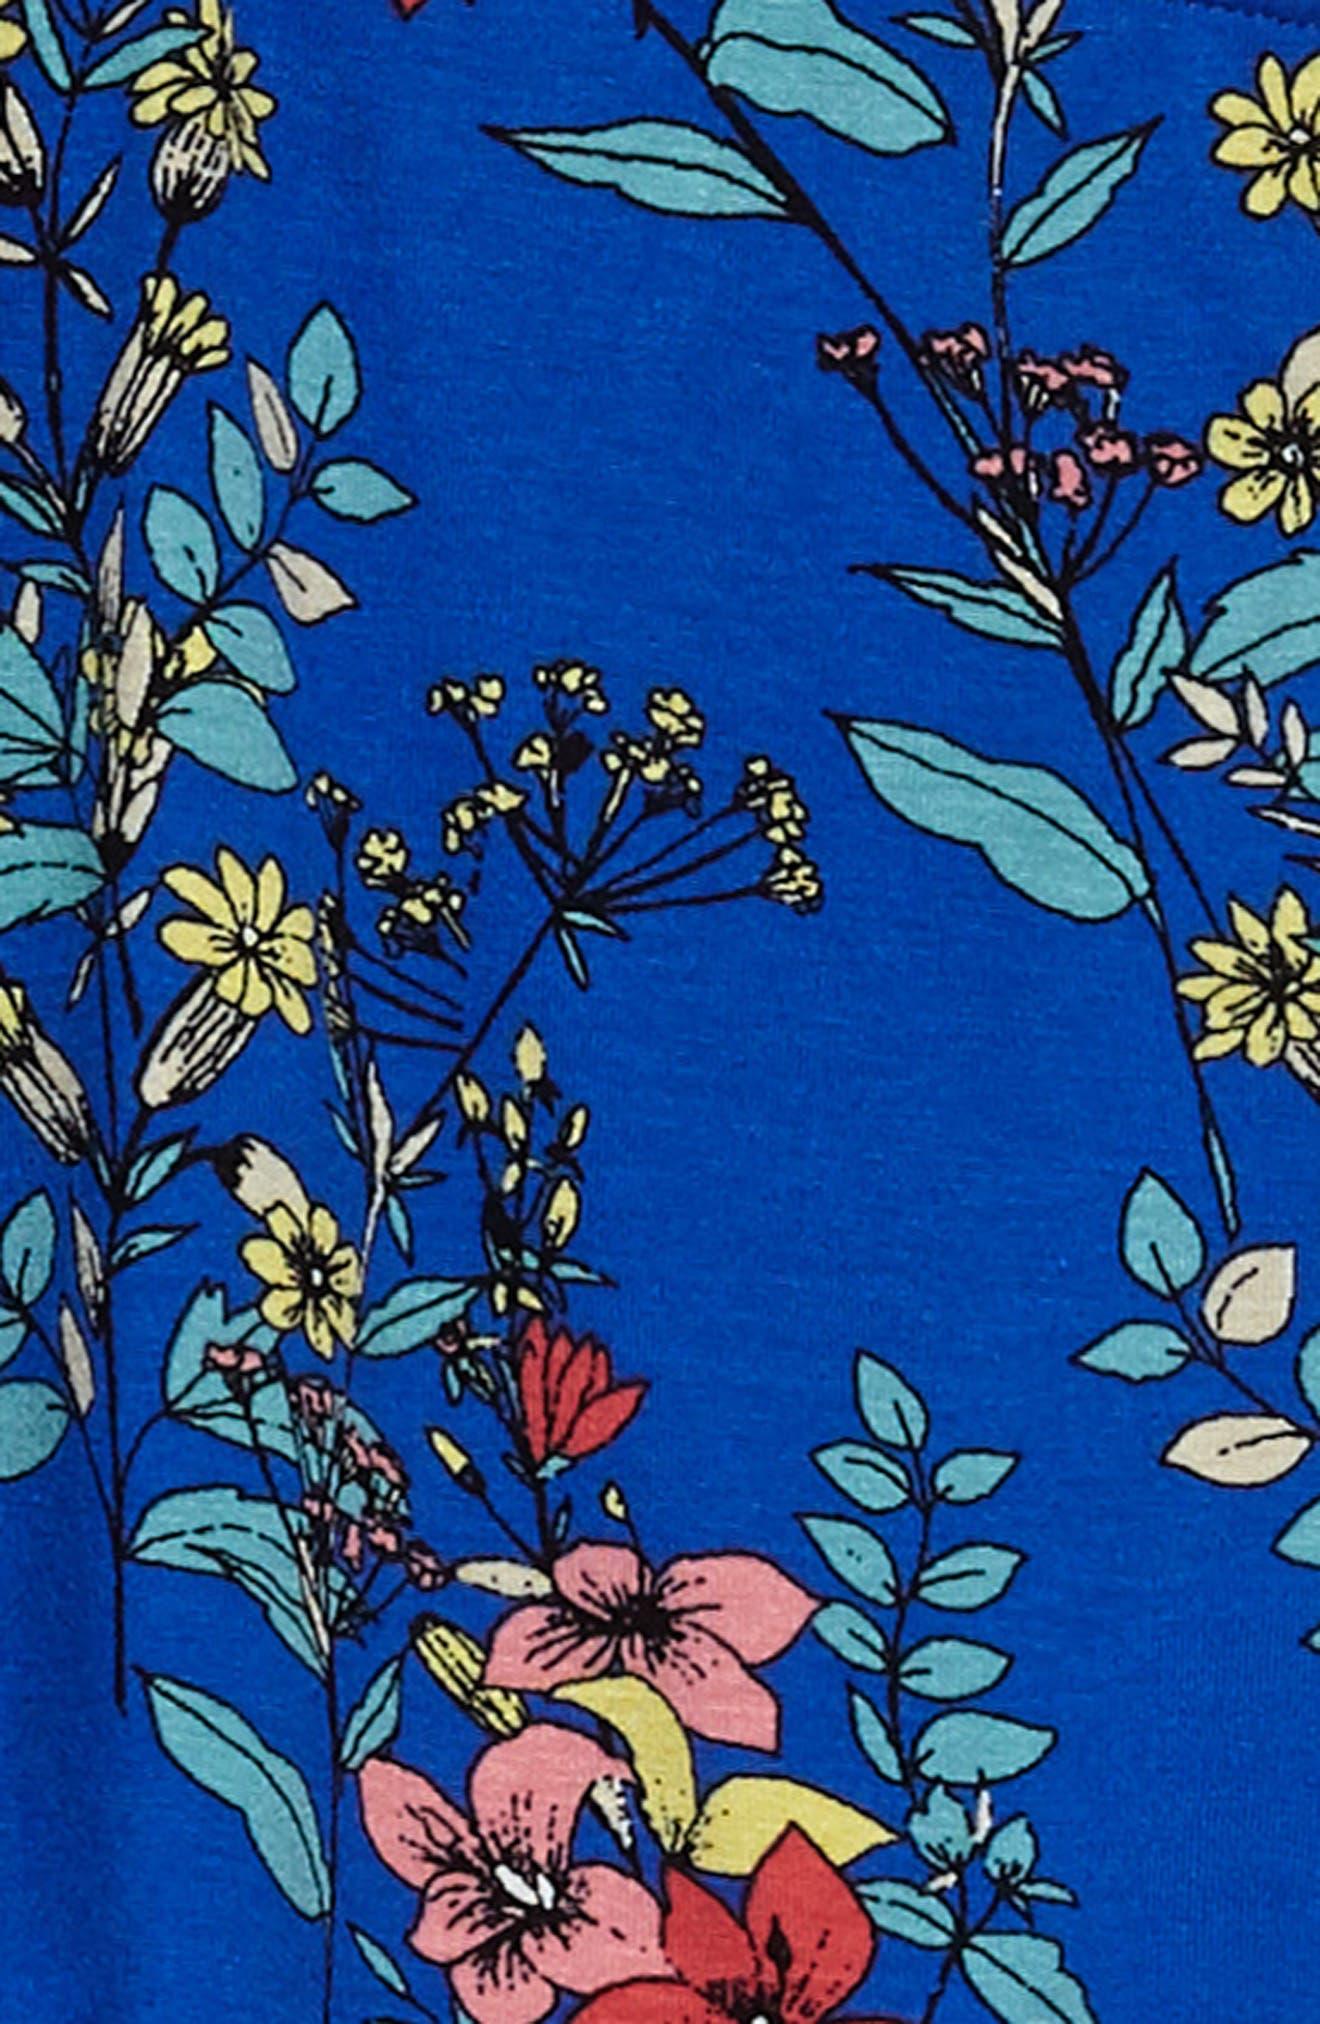 One-Shoulder Ruffle Dress,                             Alternate thumbnail 3, color,                             Royal/ Multi